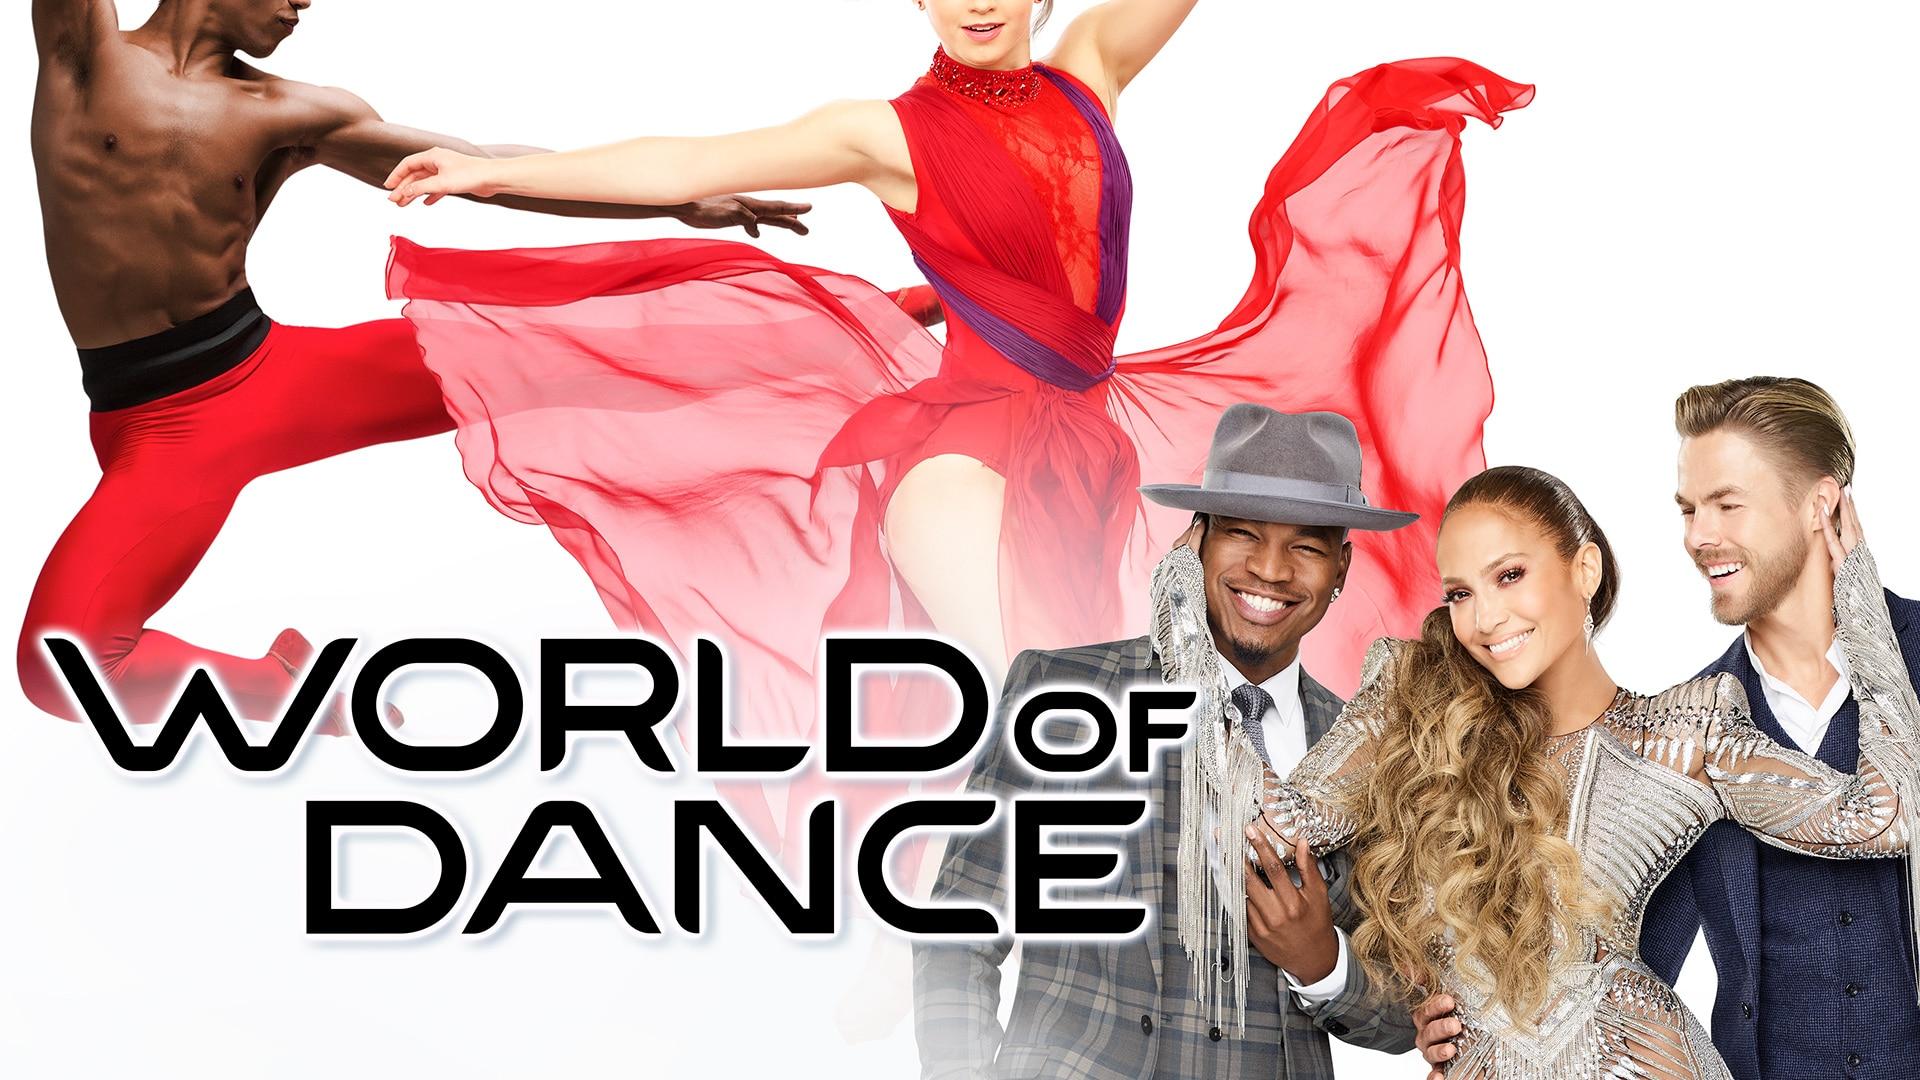 Kinjaz: World of Dance Contestant - NBC com